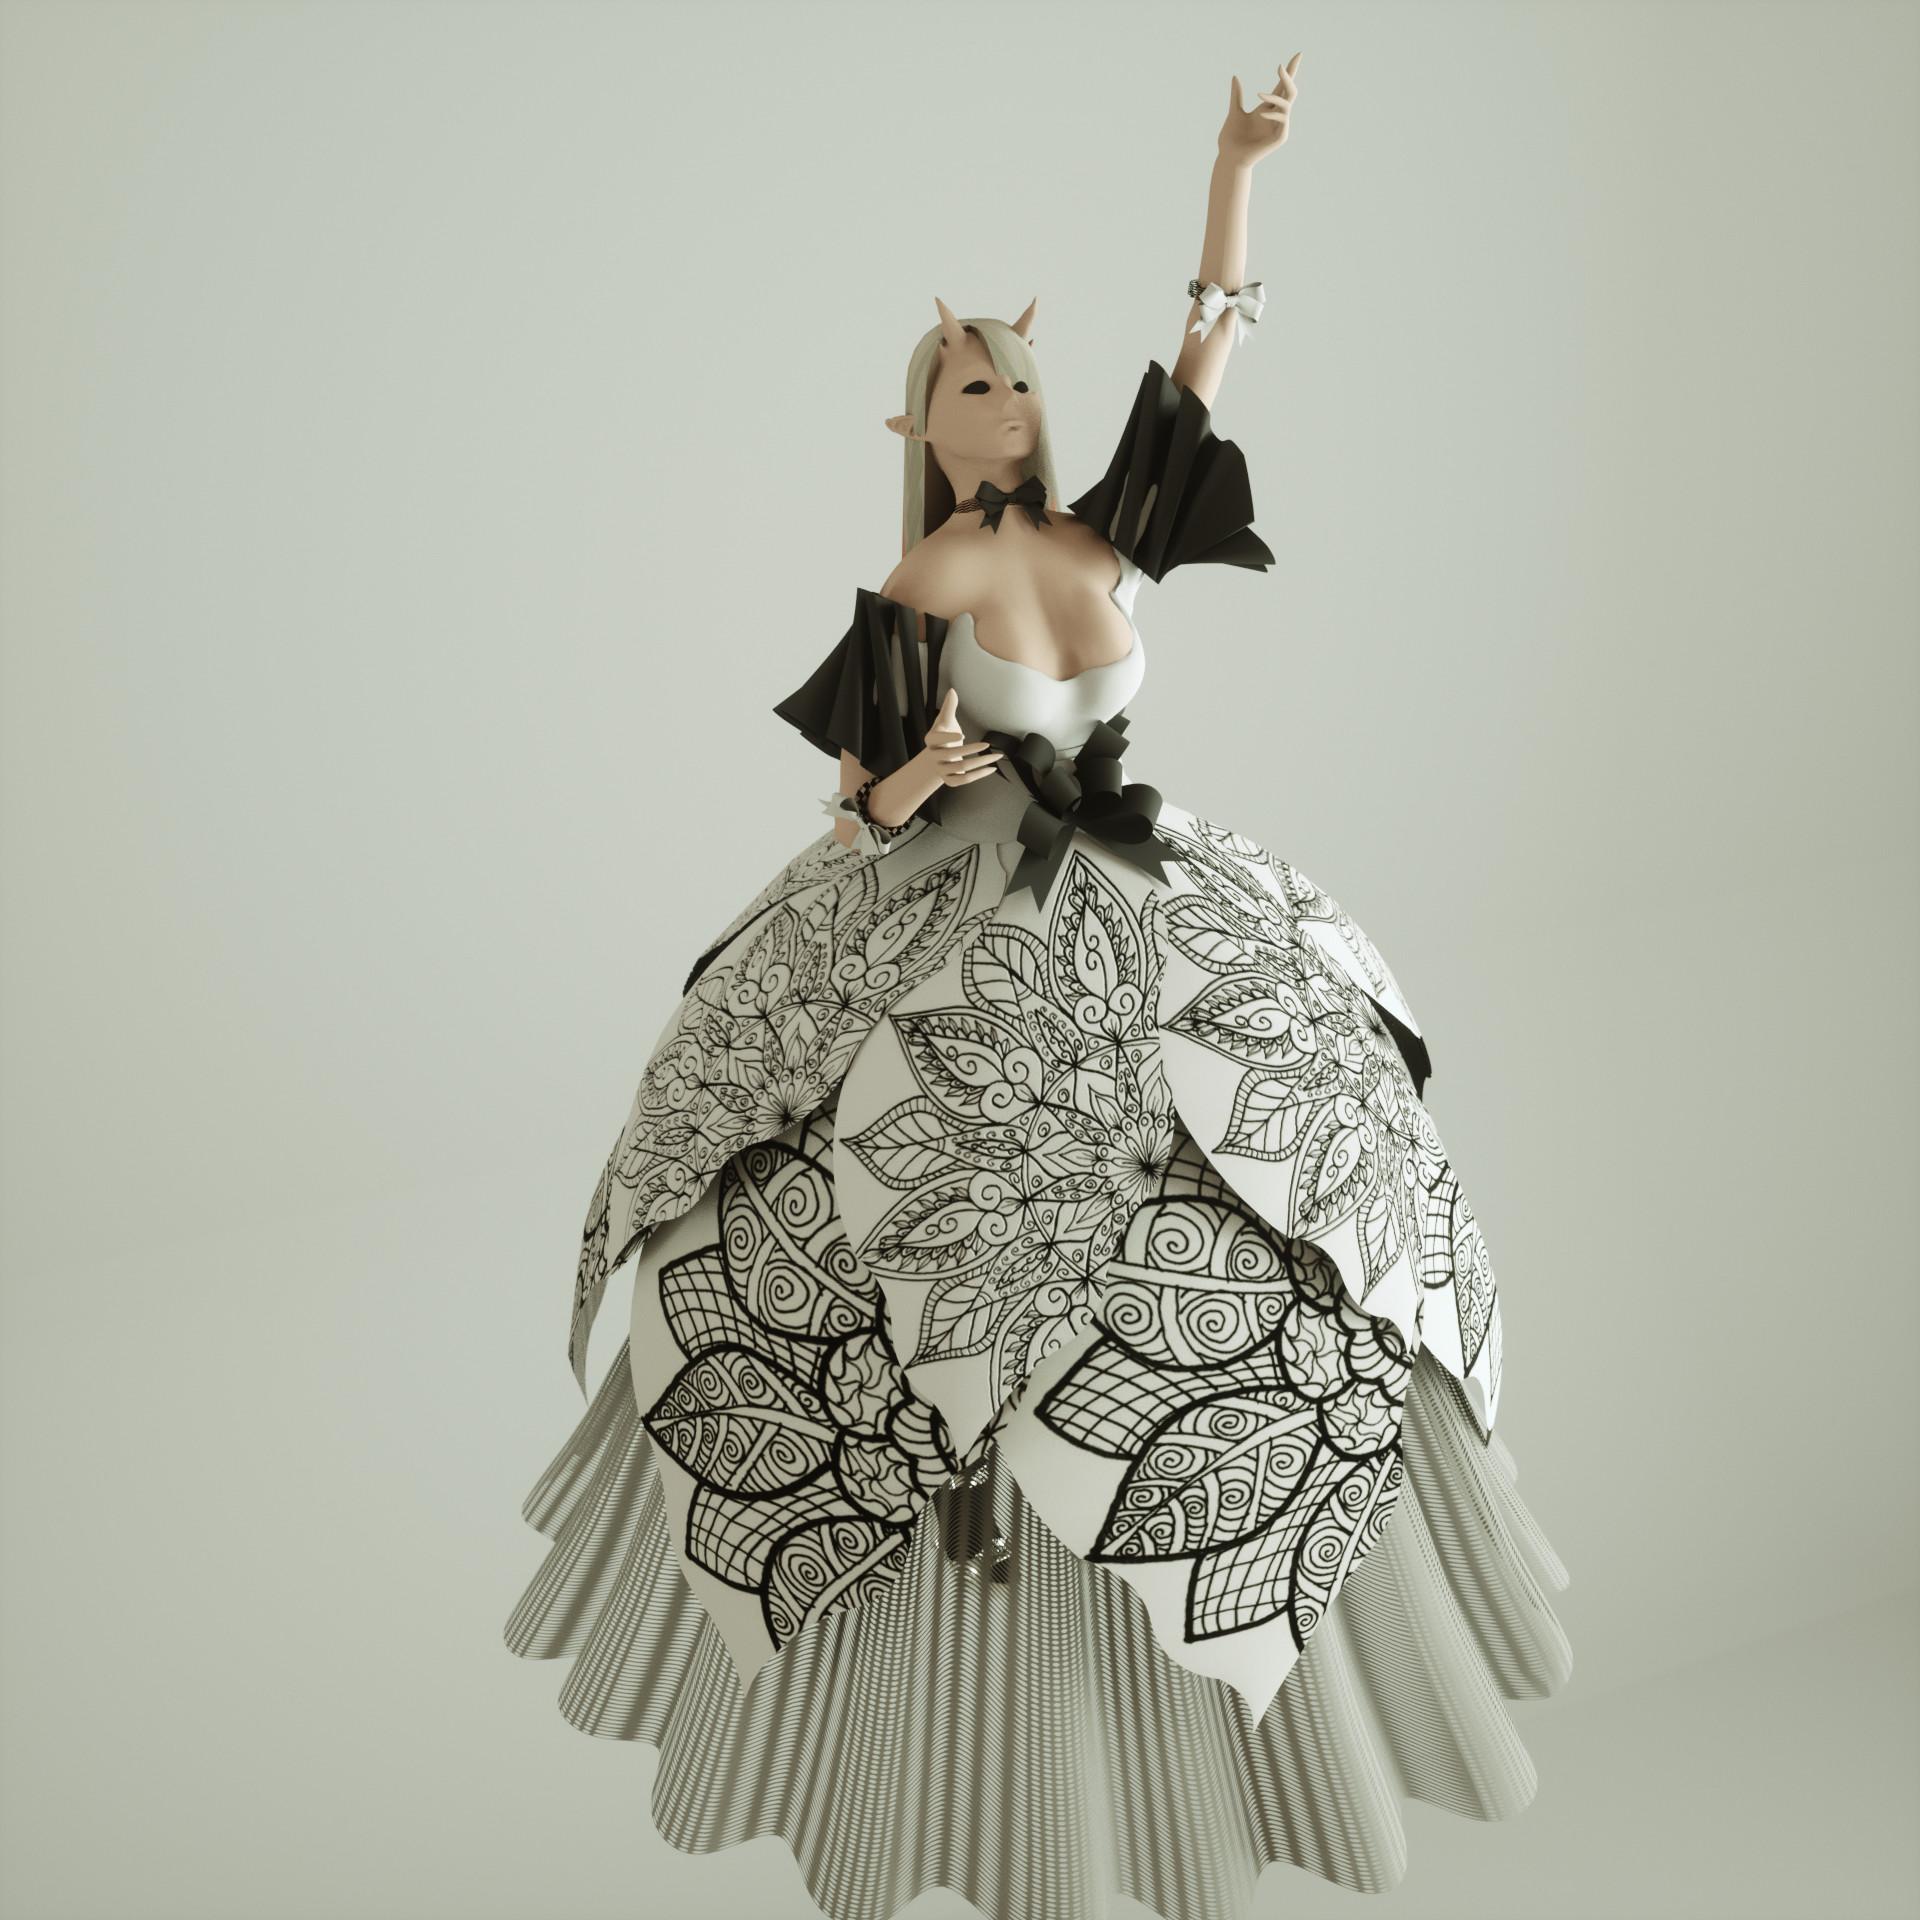 ArtStation - Ms  Iridescent, Xuanjue Tong